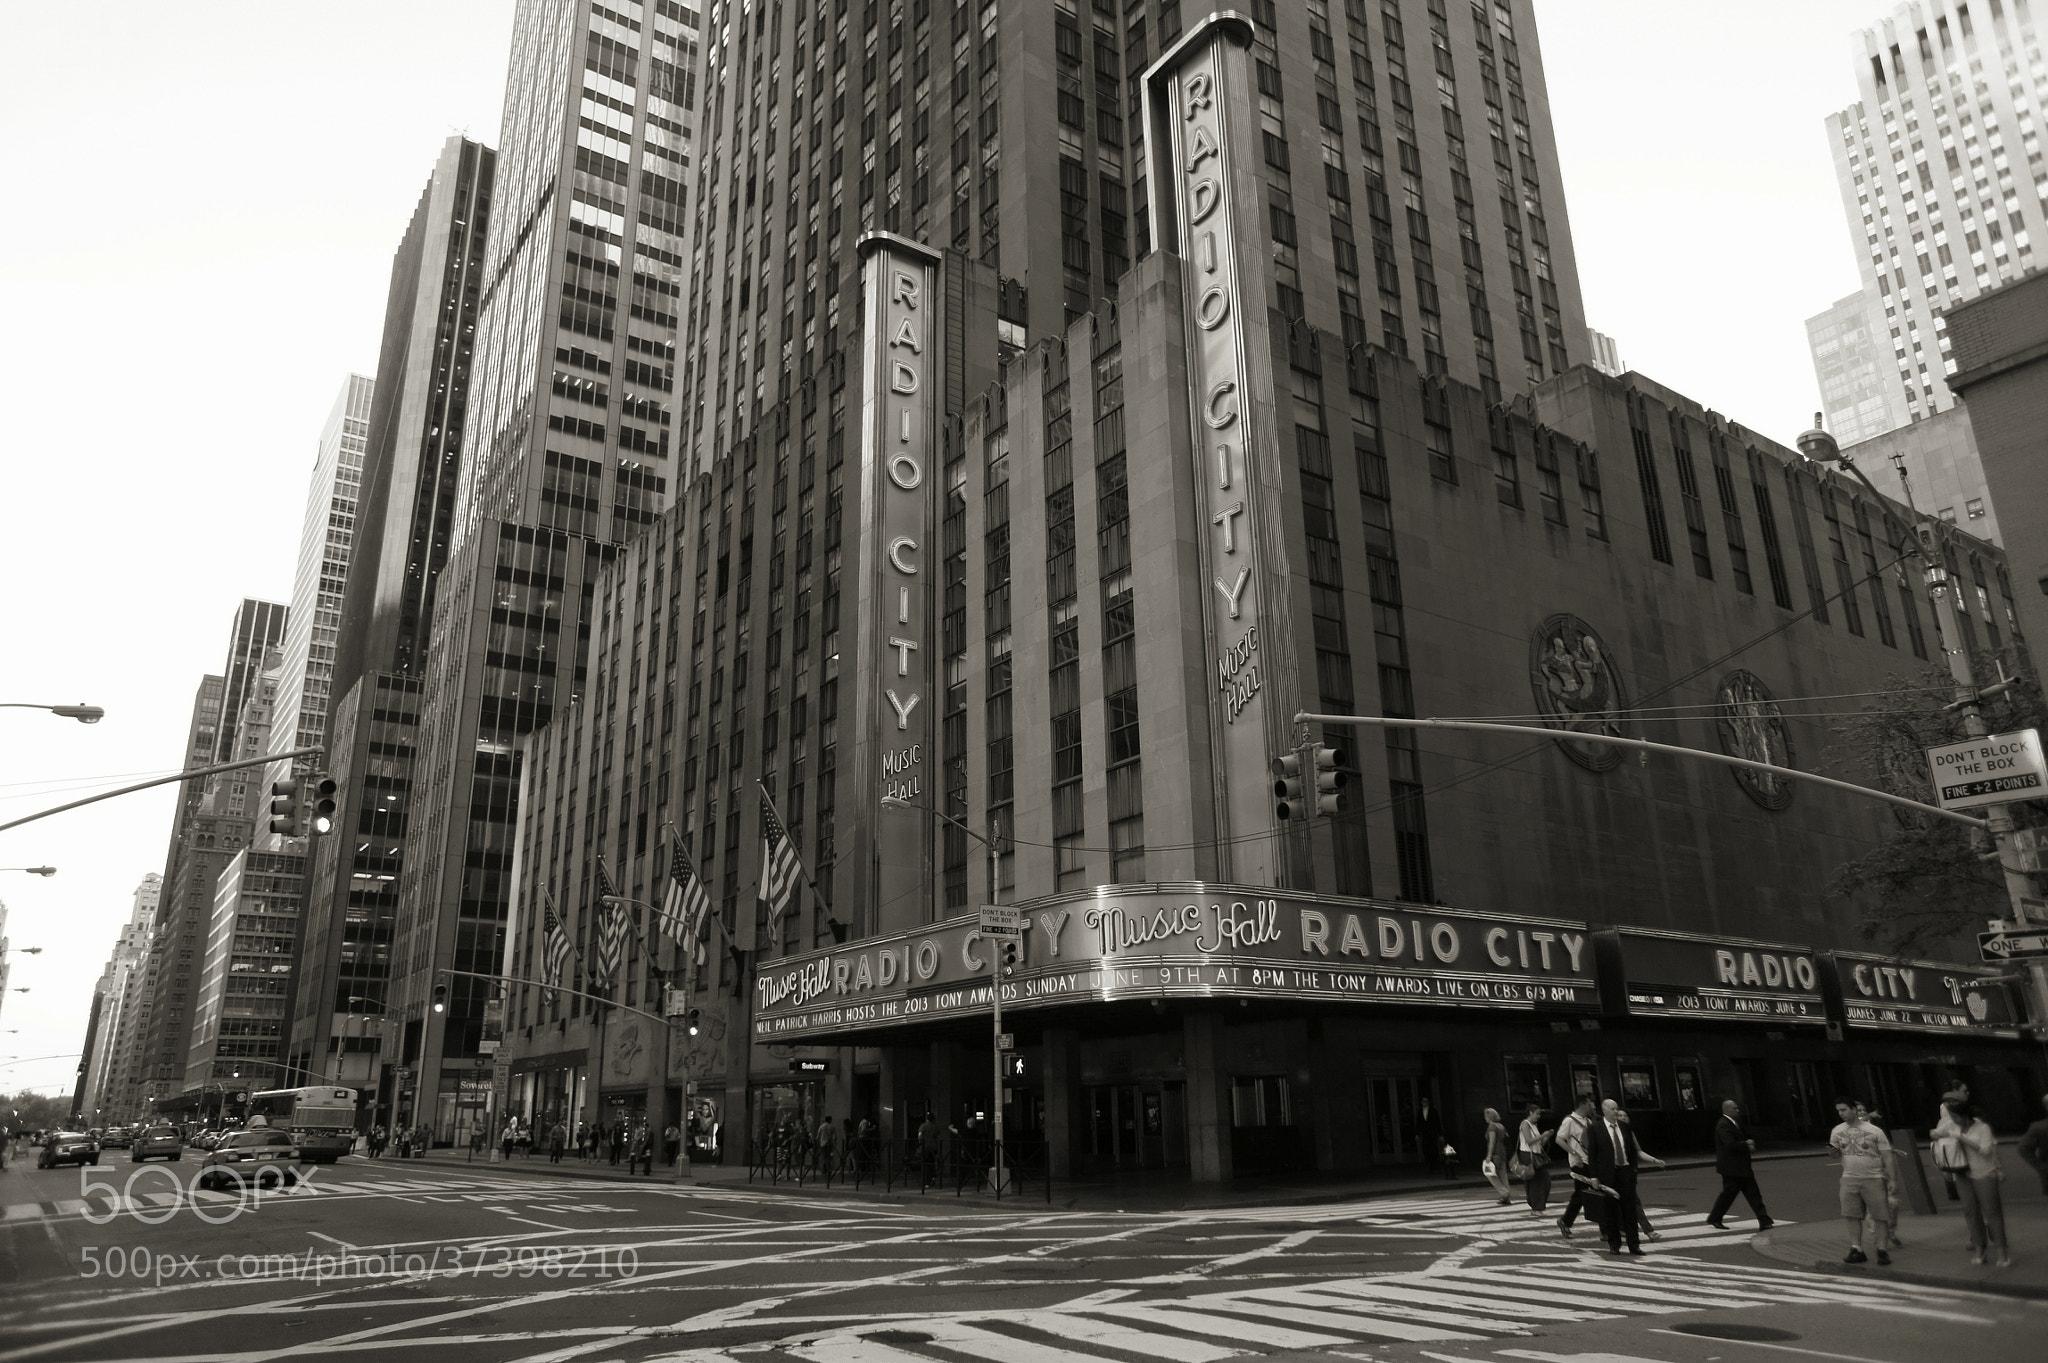 Photograph Radio City by Gavin Gordon  on 500px